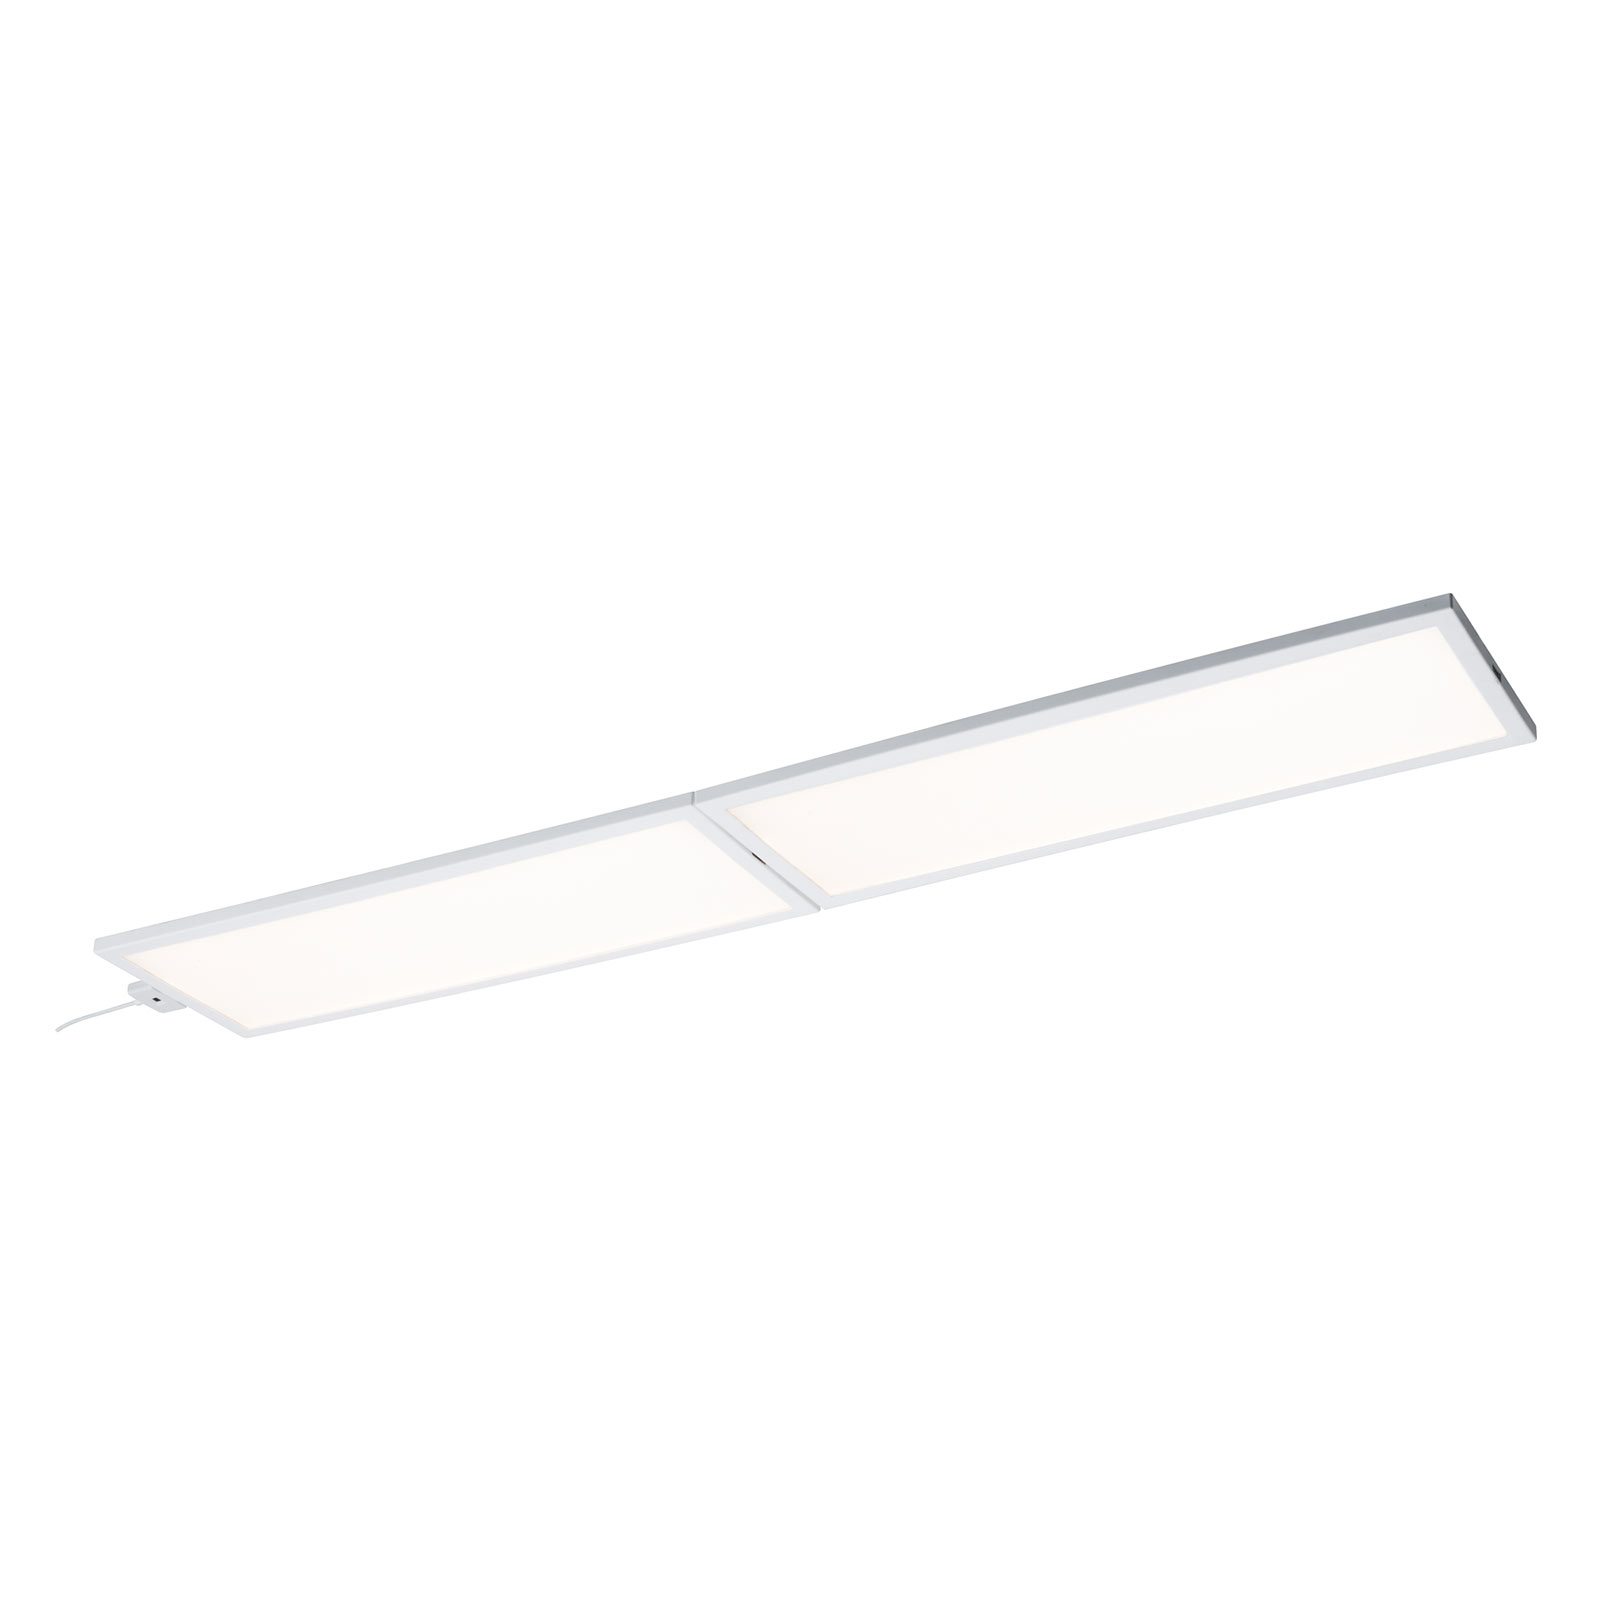 Paulmann Ace lampada LED da mobili, estensione